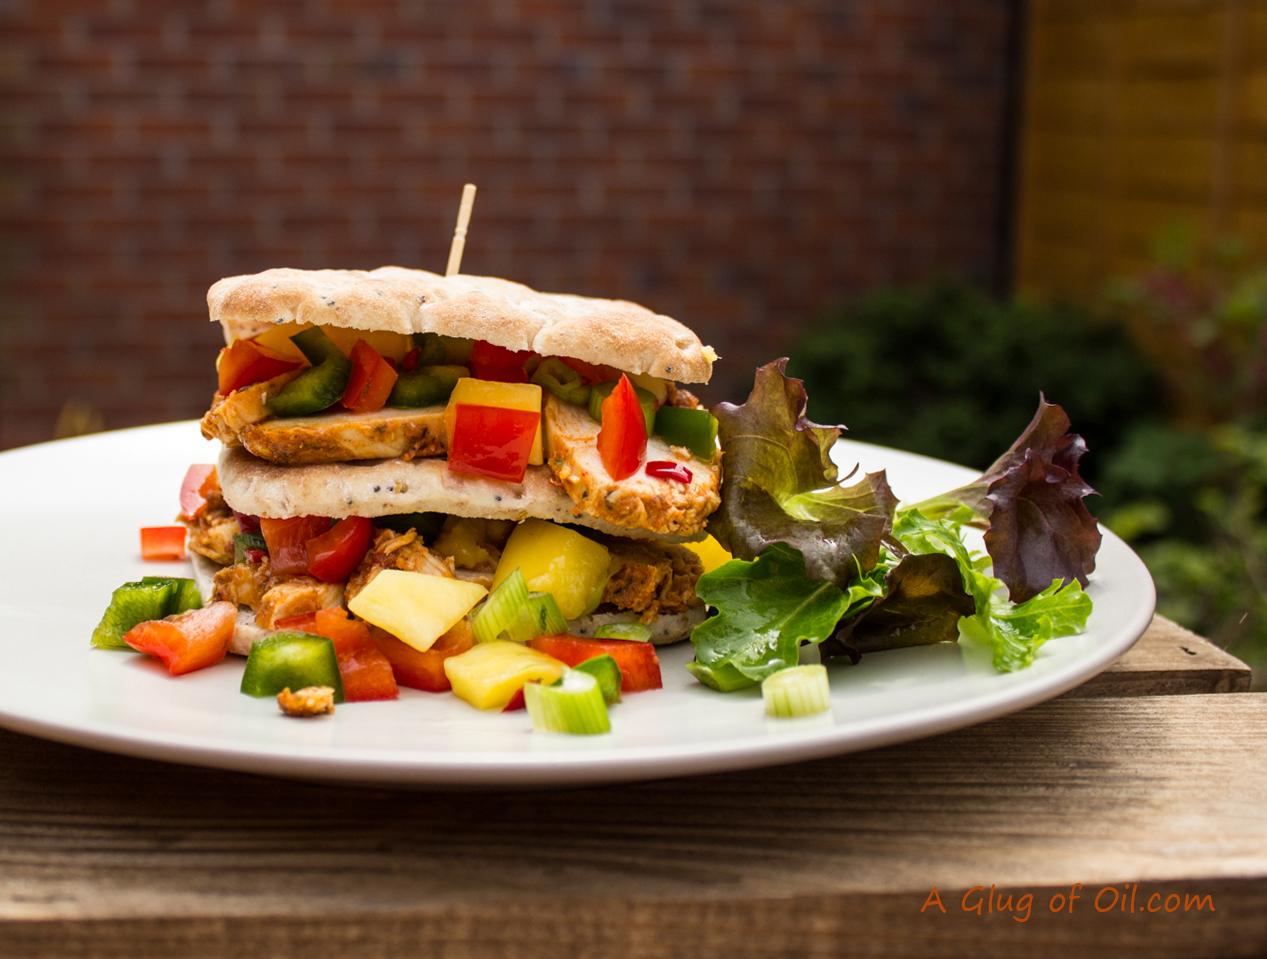 Fiery Chicken Club Sandwich with Mango Salsa